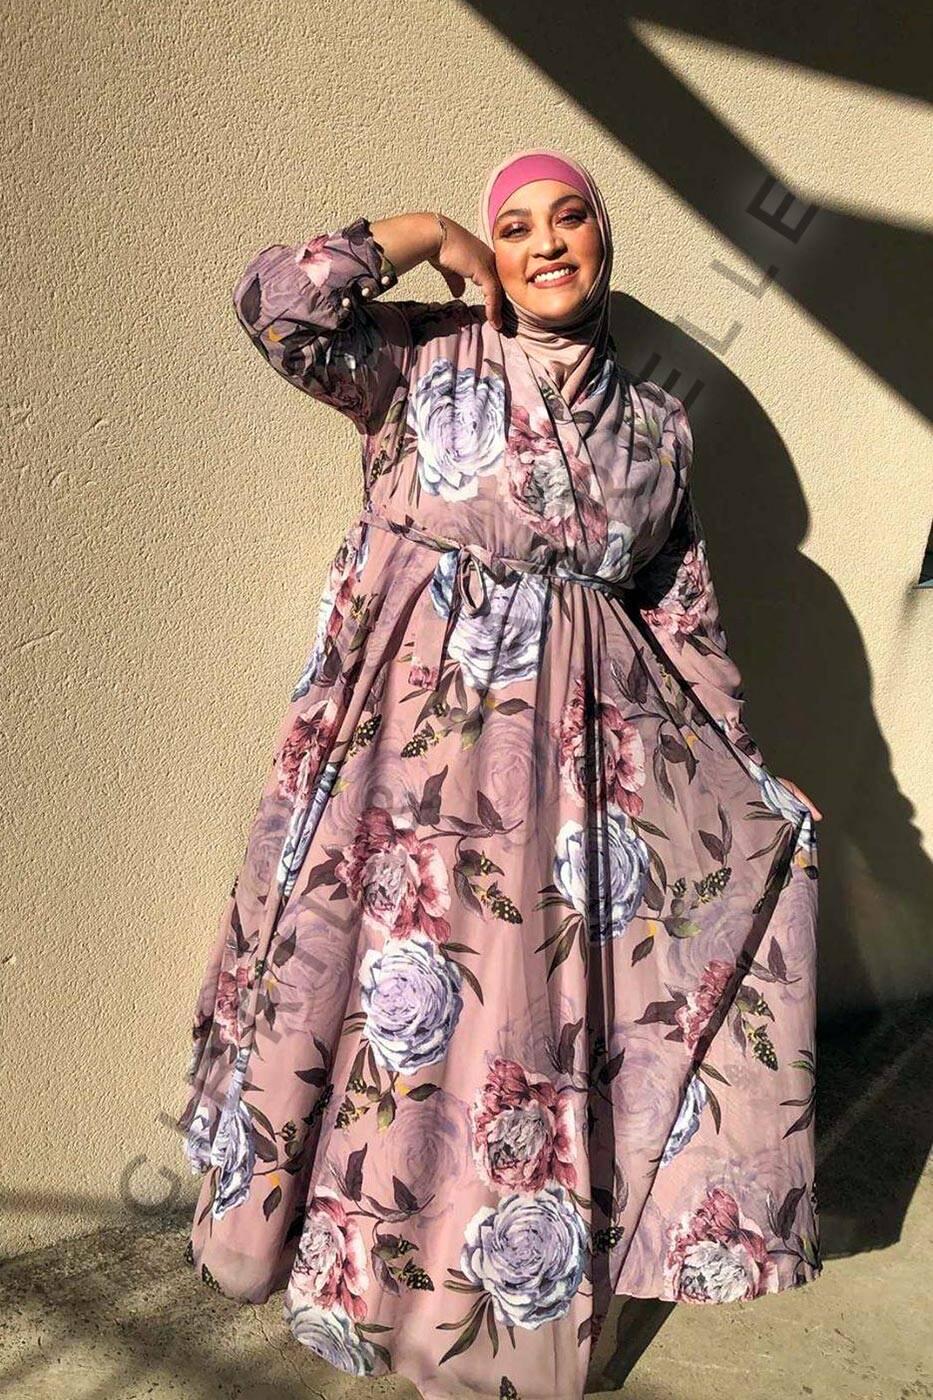 Fethia Elbise